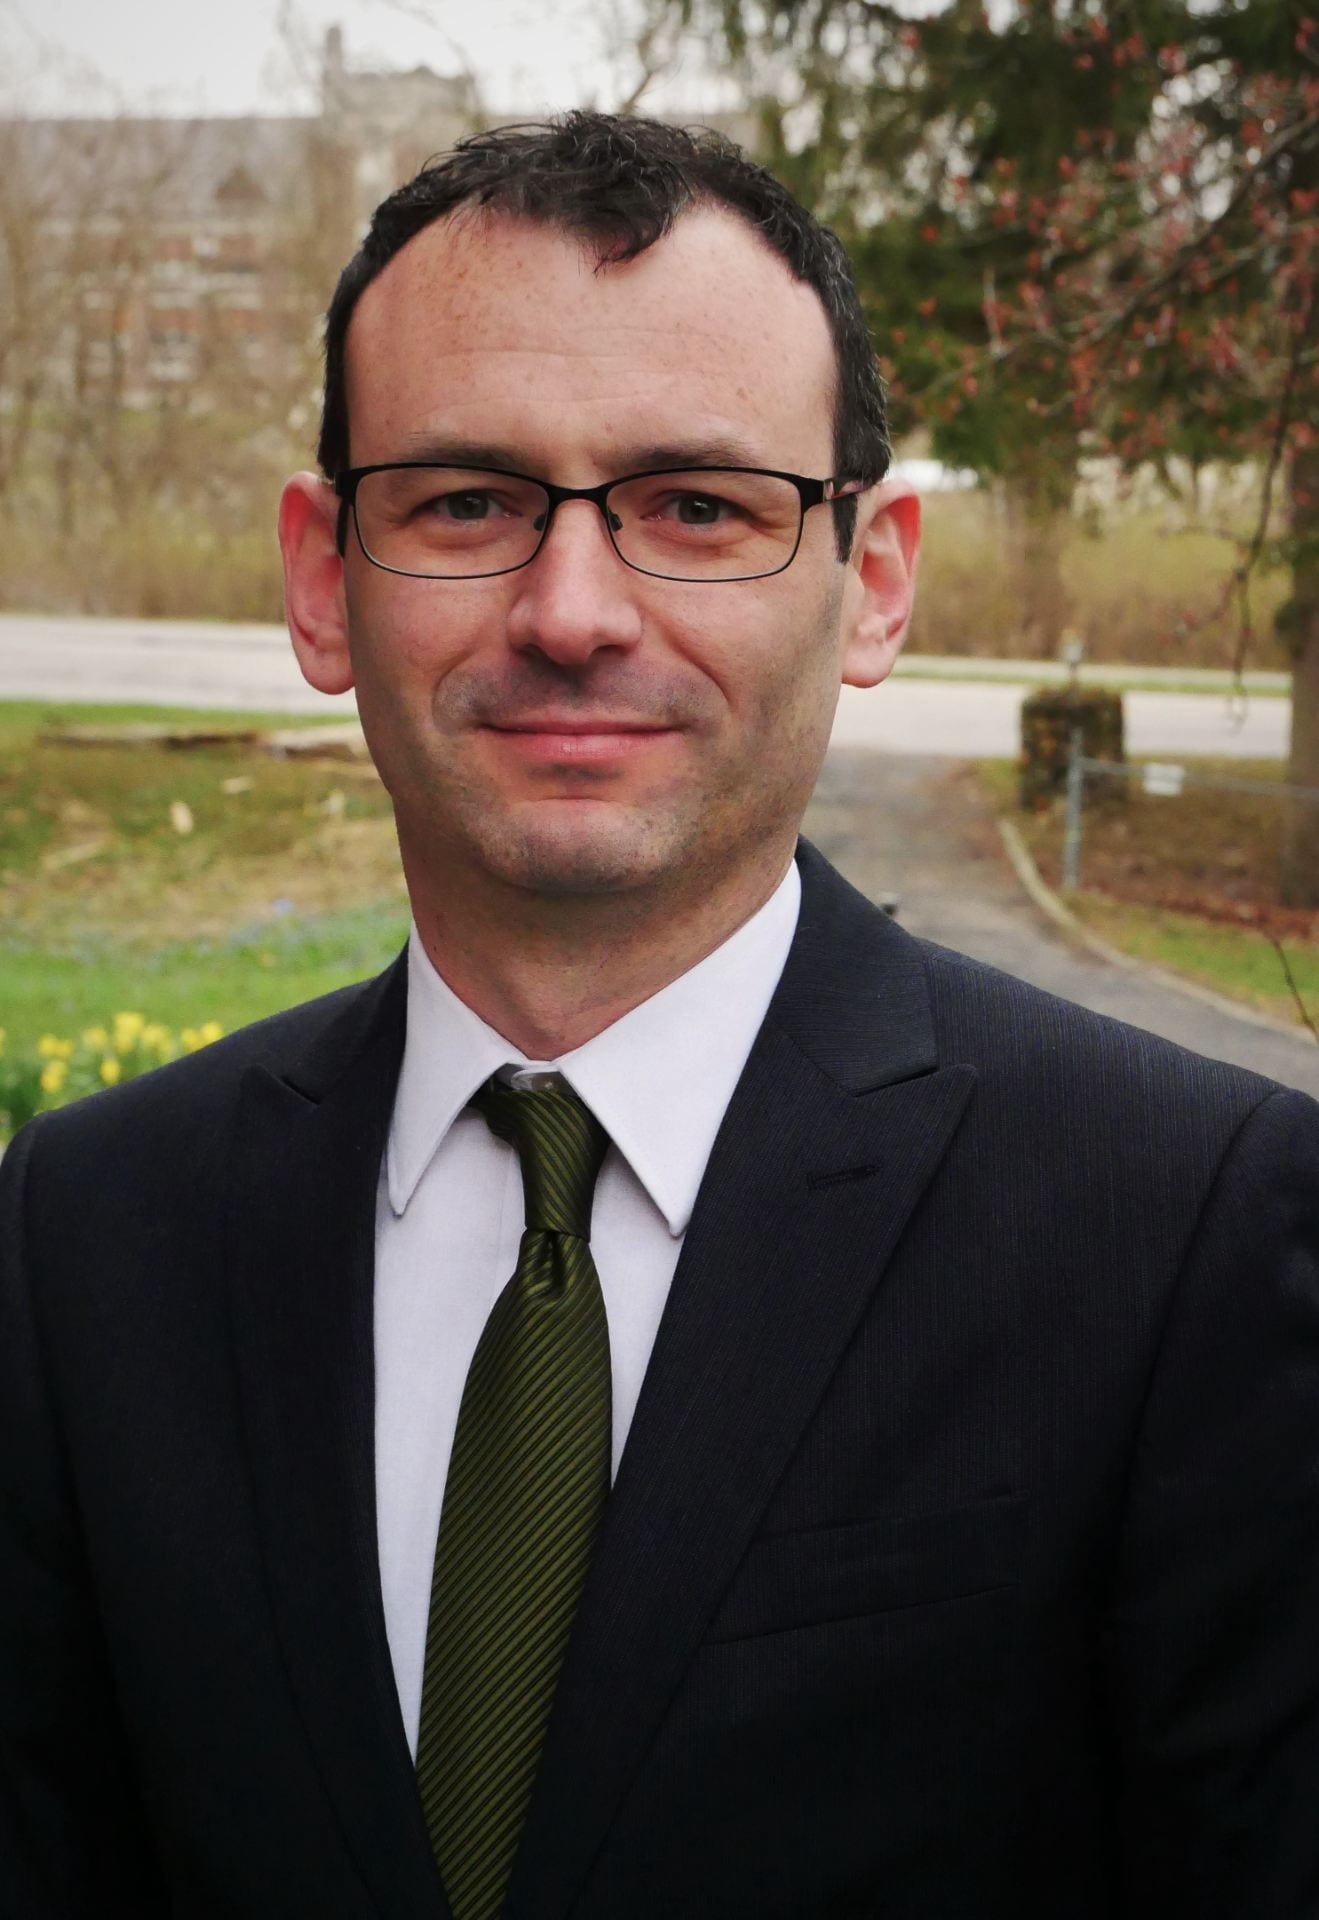 Richard Brandon-Friedman Professional Headshot